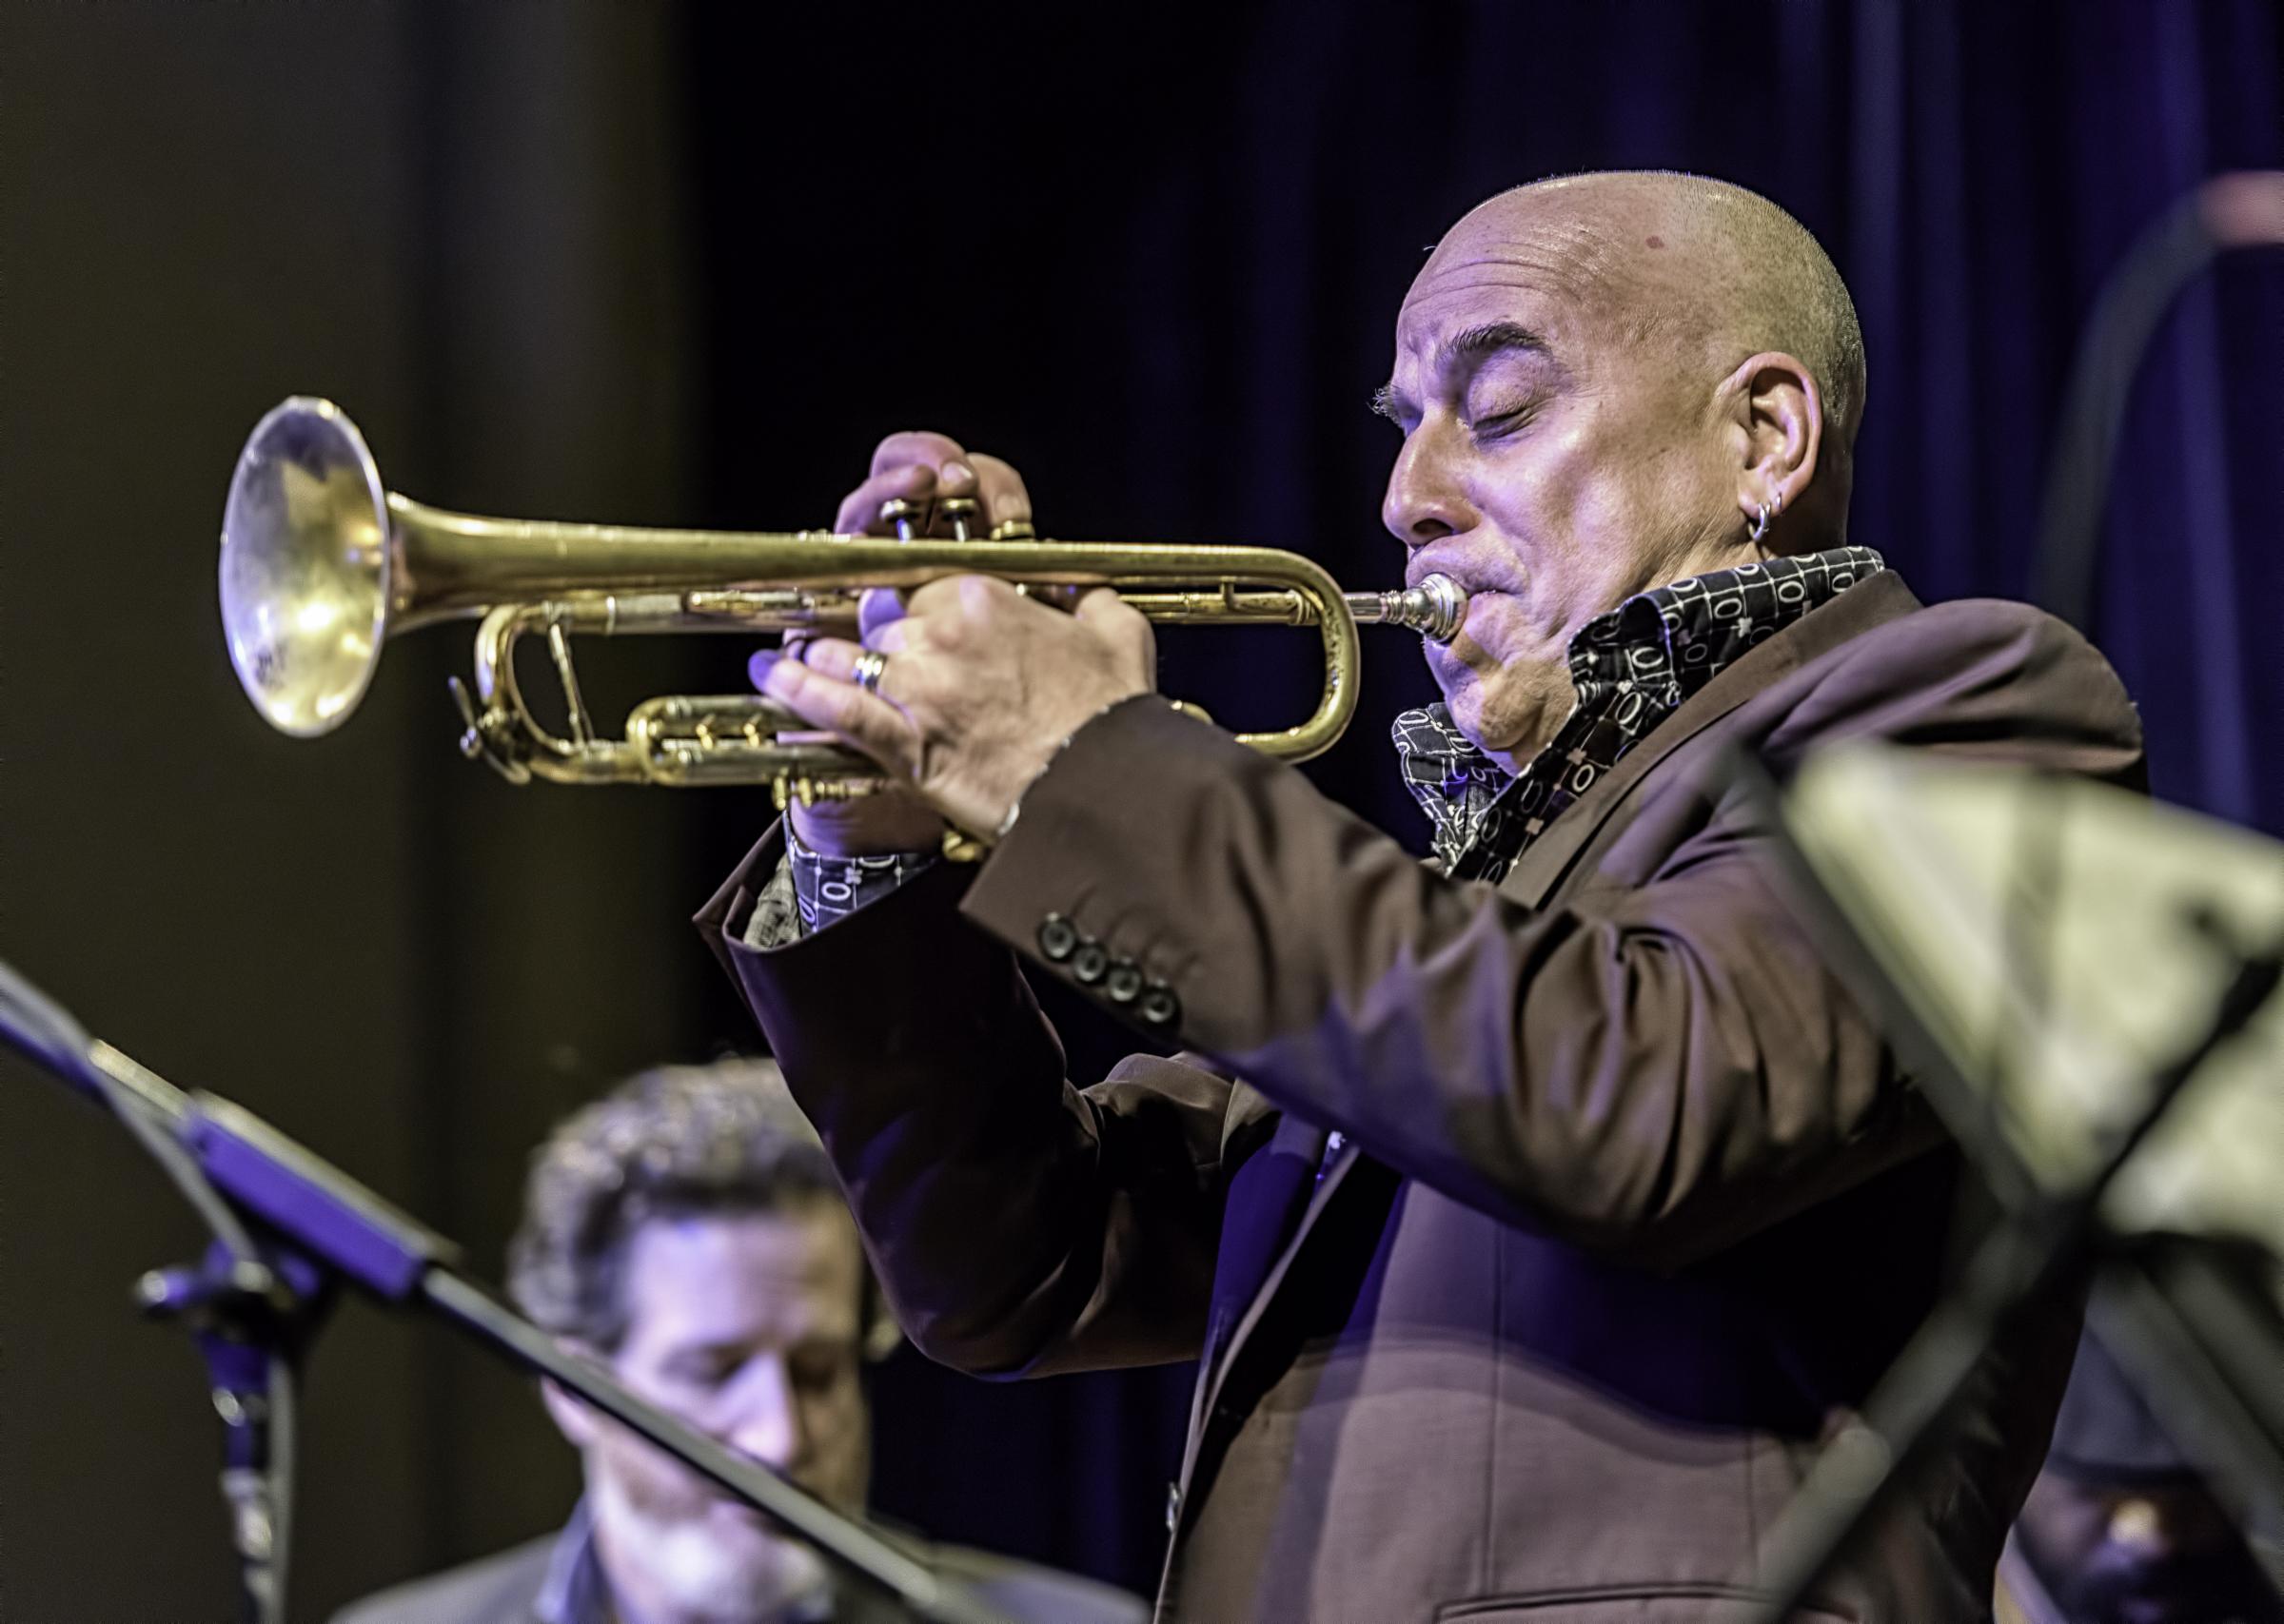 Steven Bernstein with Butler, Bernstein and the Hot 9 at the NYC Winter Jazzfest 2016